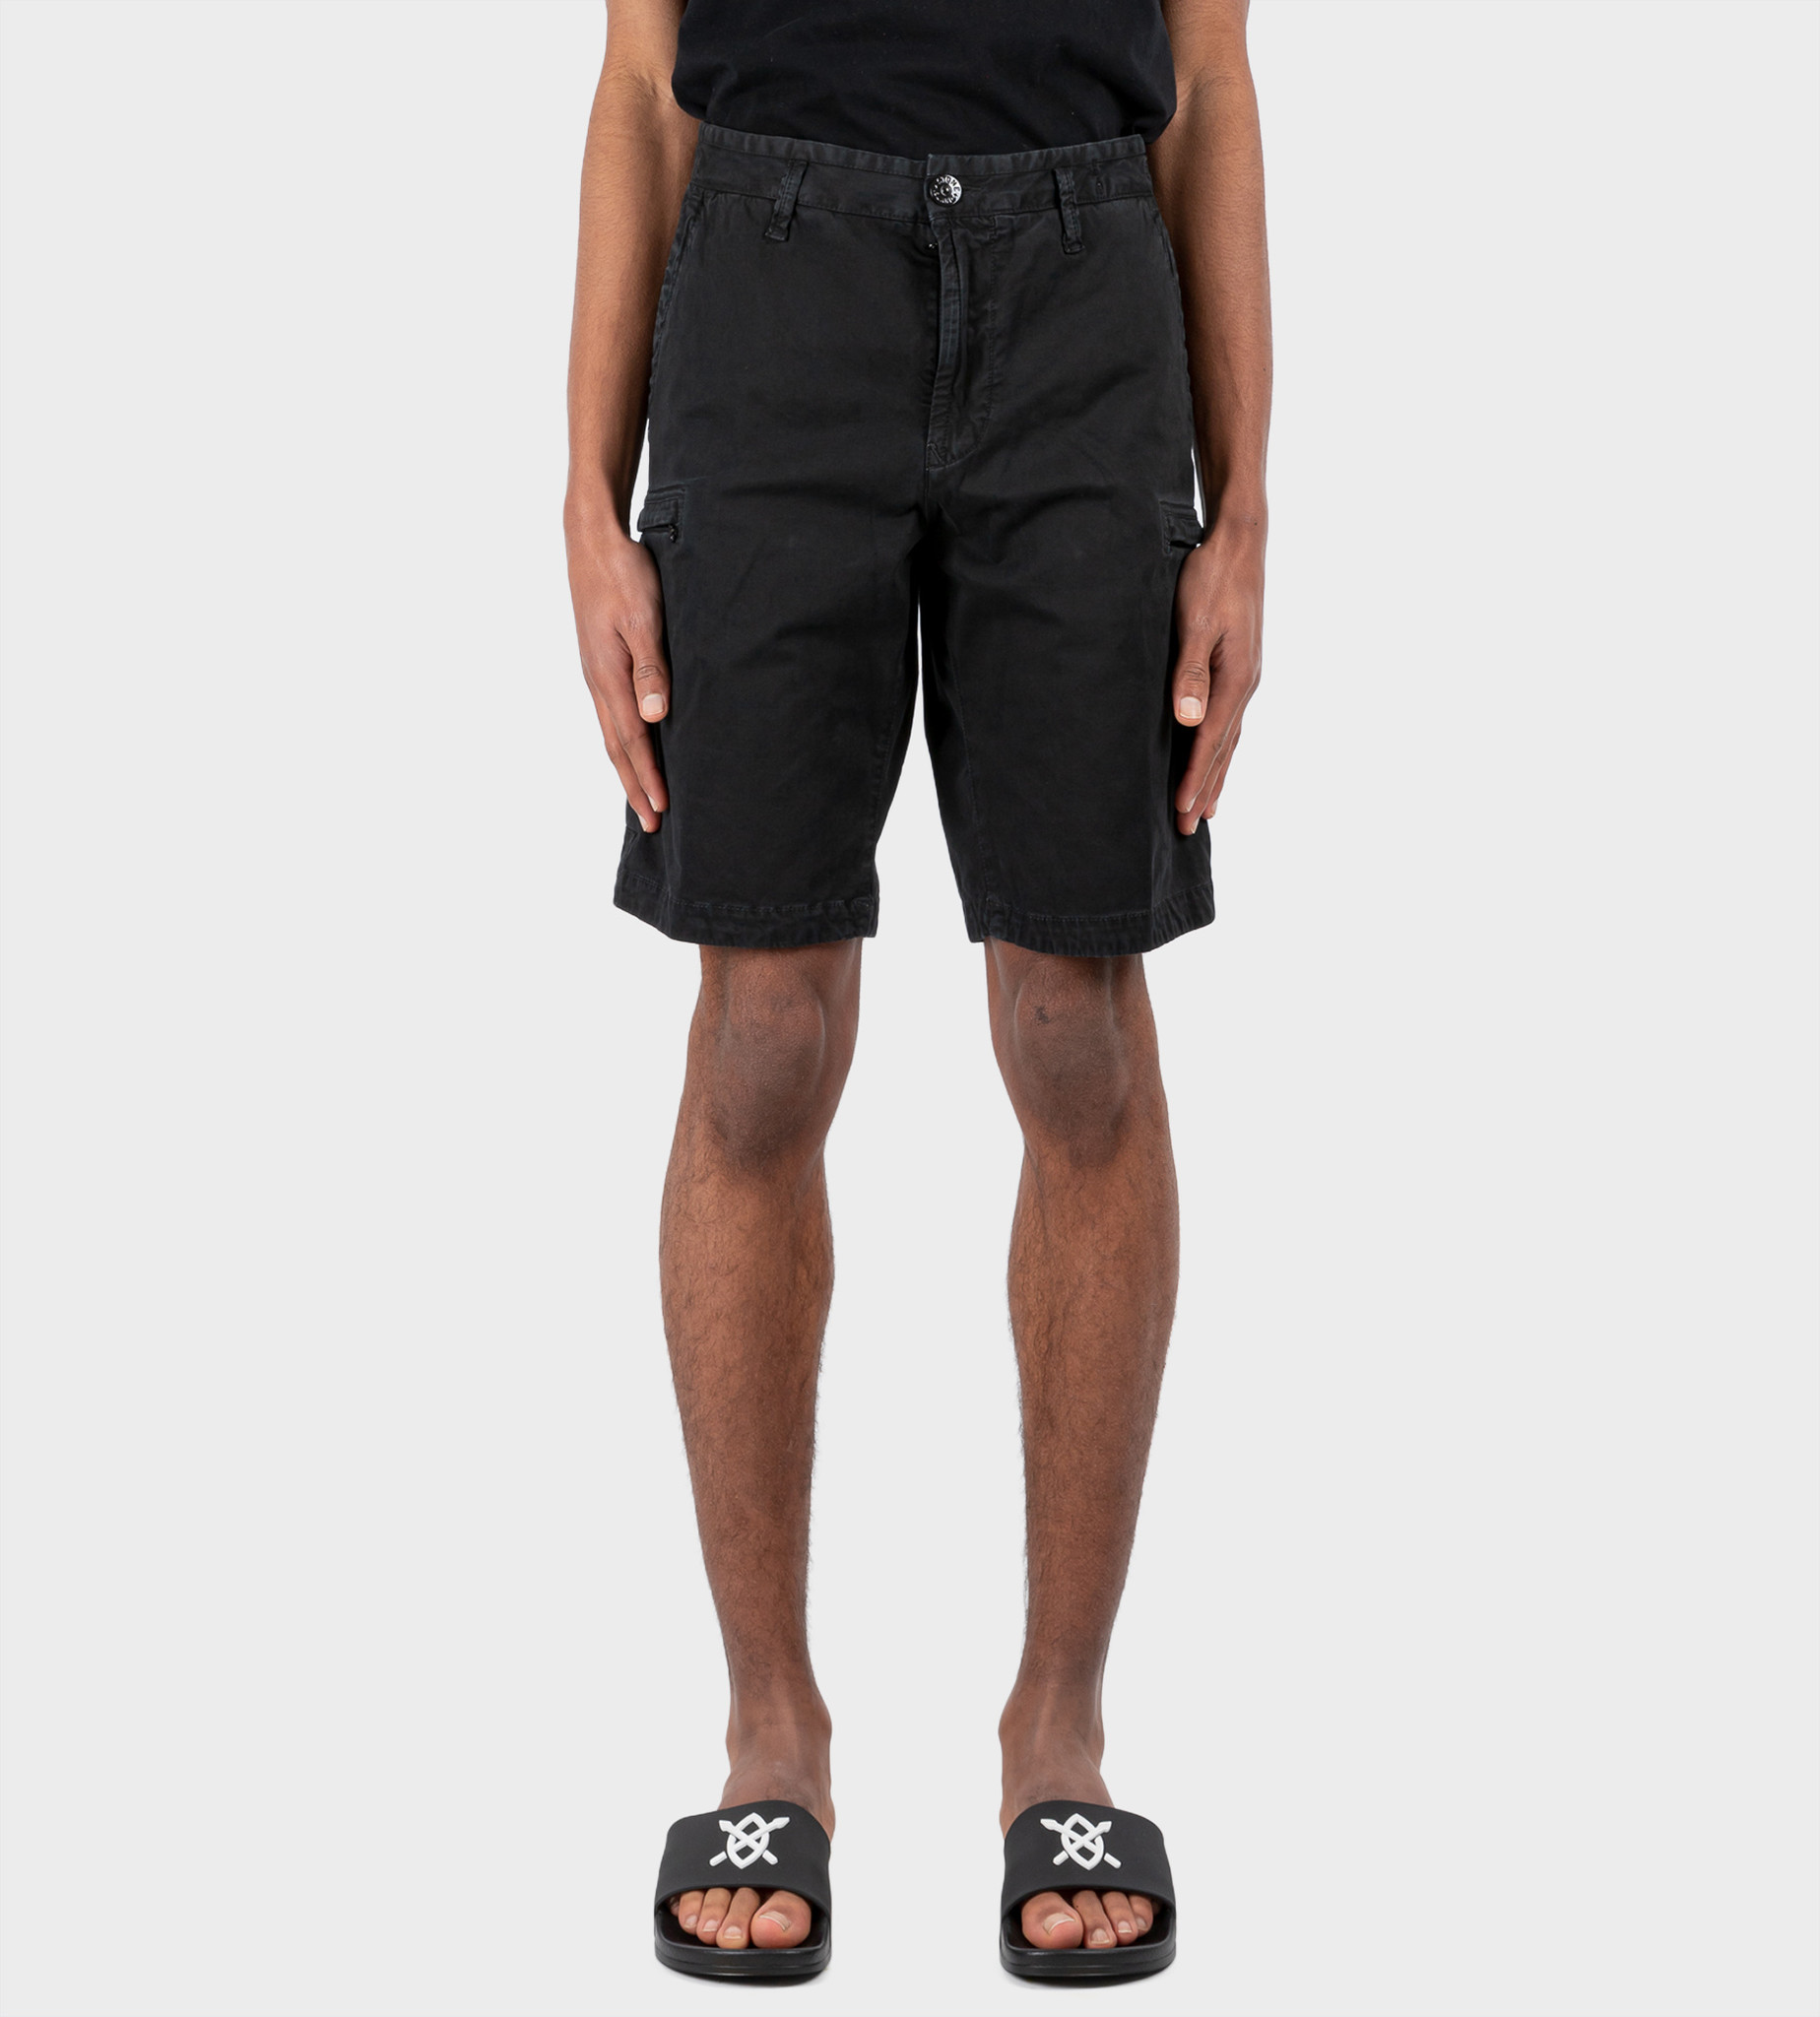 STONE ISLAND Cargo Bermuda Shorts Black